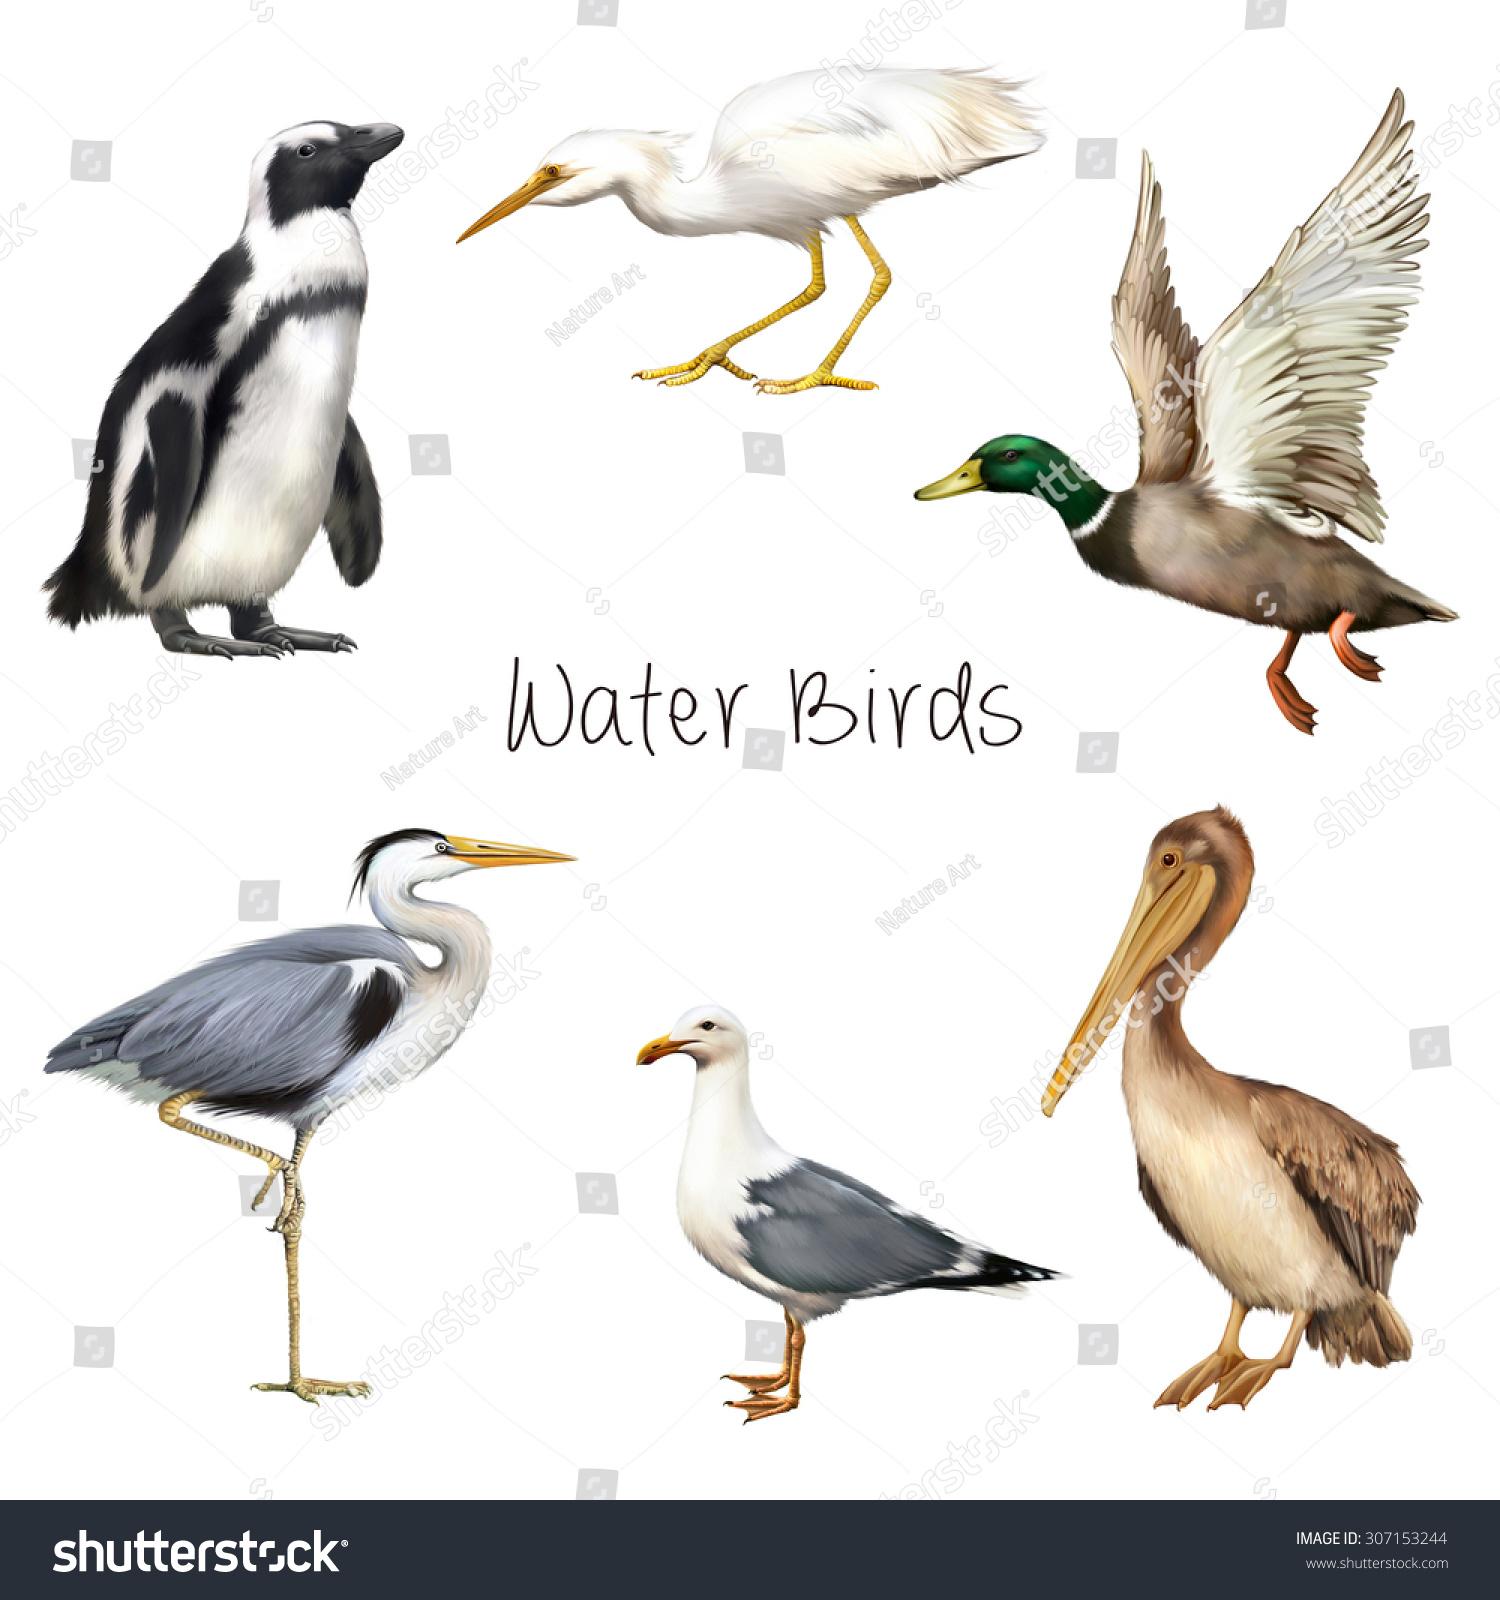 Stock Photo Illustration Of Water Birds Pelican Crane Bird Seagull Pen...